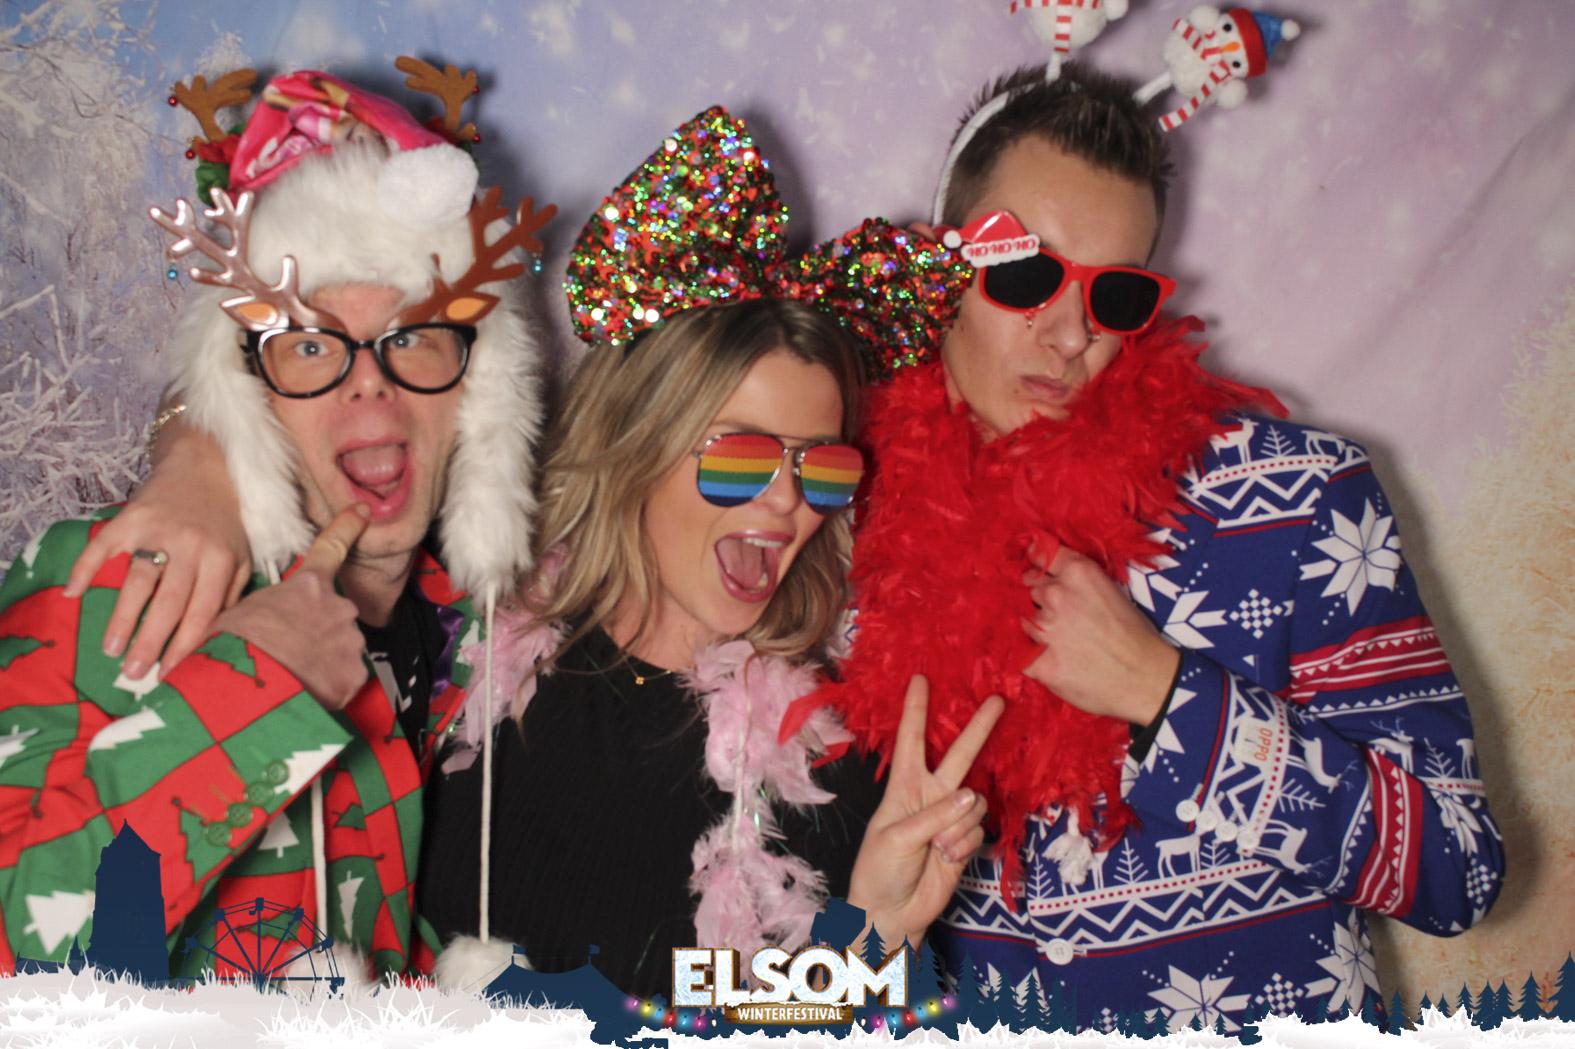 Elsom Winter Full (55 van 786)